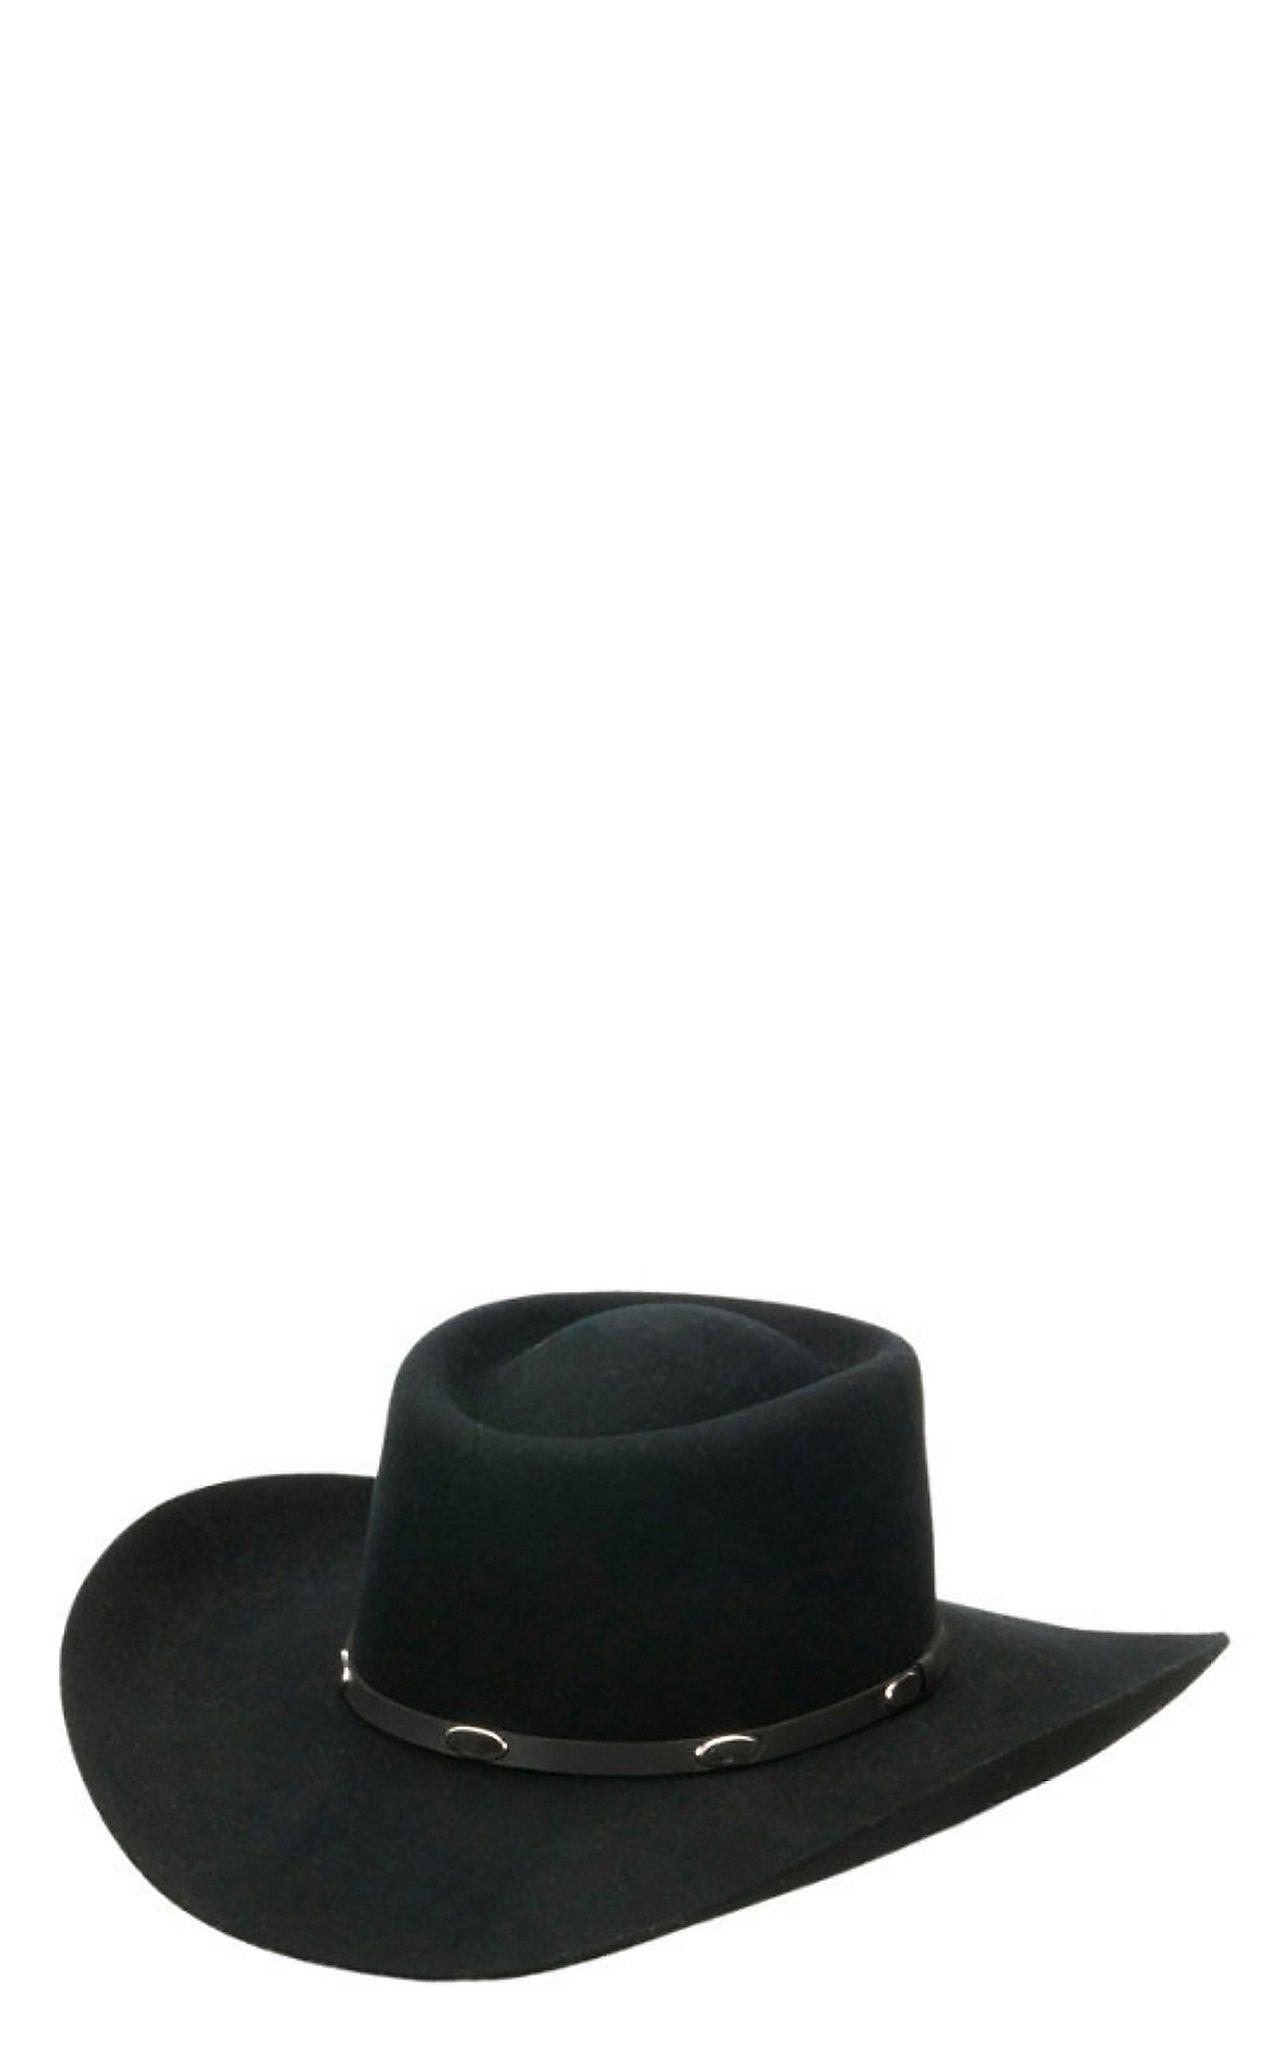 Master Hatters 3X Hold Em Gambler Black Wool Cowboy Hat dc9f6d7cd817